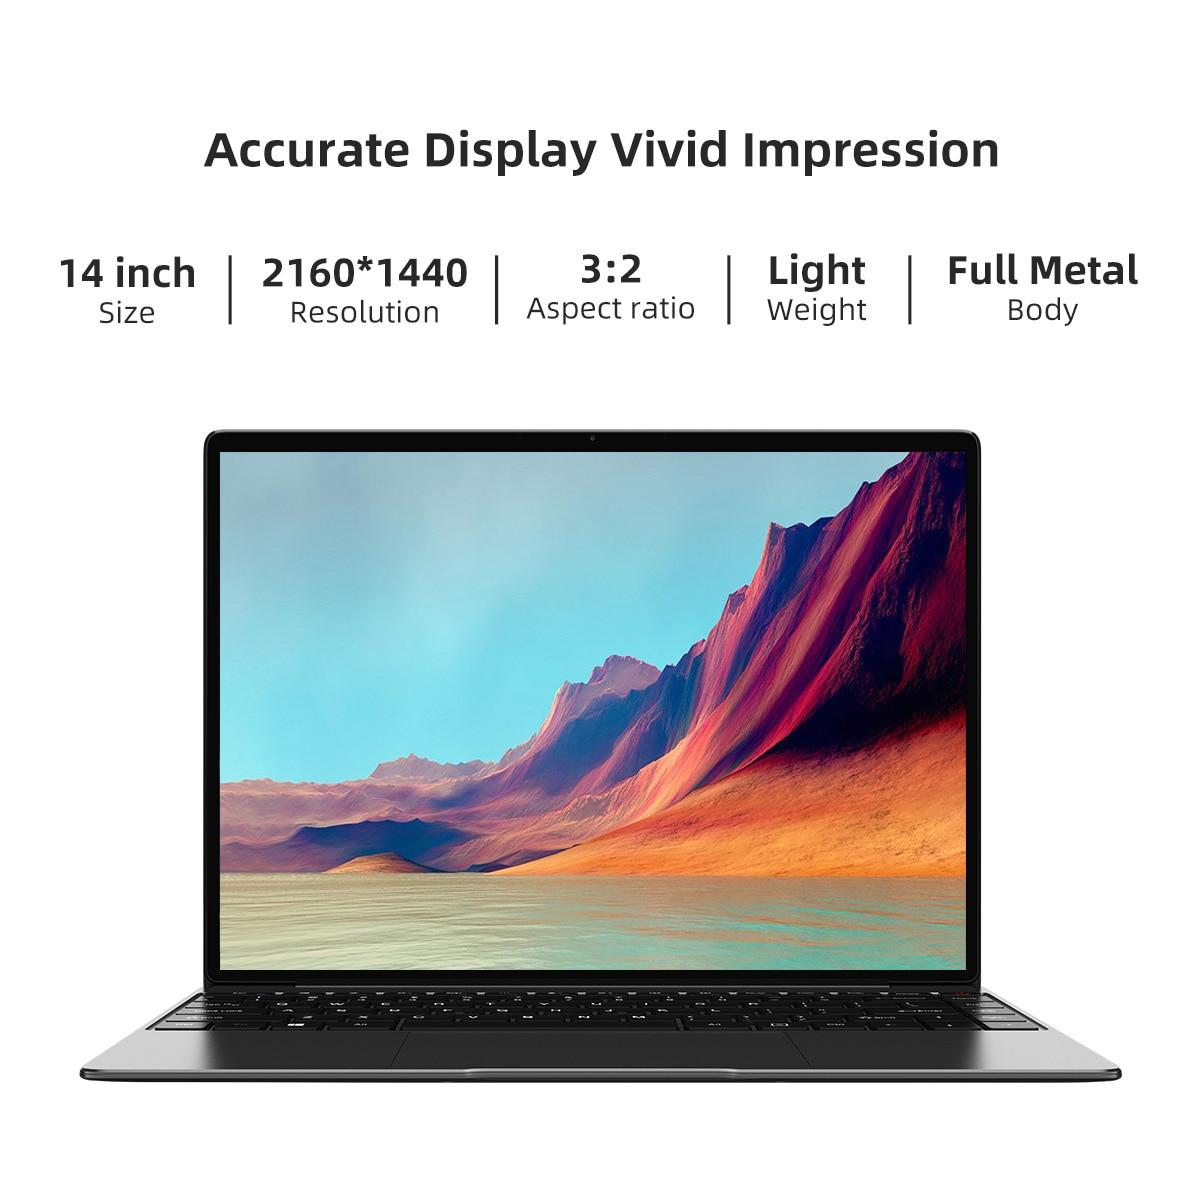 CHUWI CoreBook X Intel Core i5-8259U Laptops 14 Inch 2160x1440 Resolution DDR4 8GB 512GB SSD Winddows 10 Computer 46.2W Battery 4